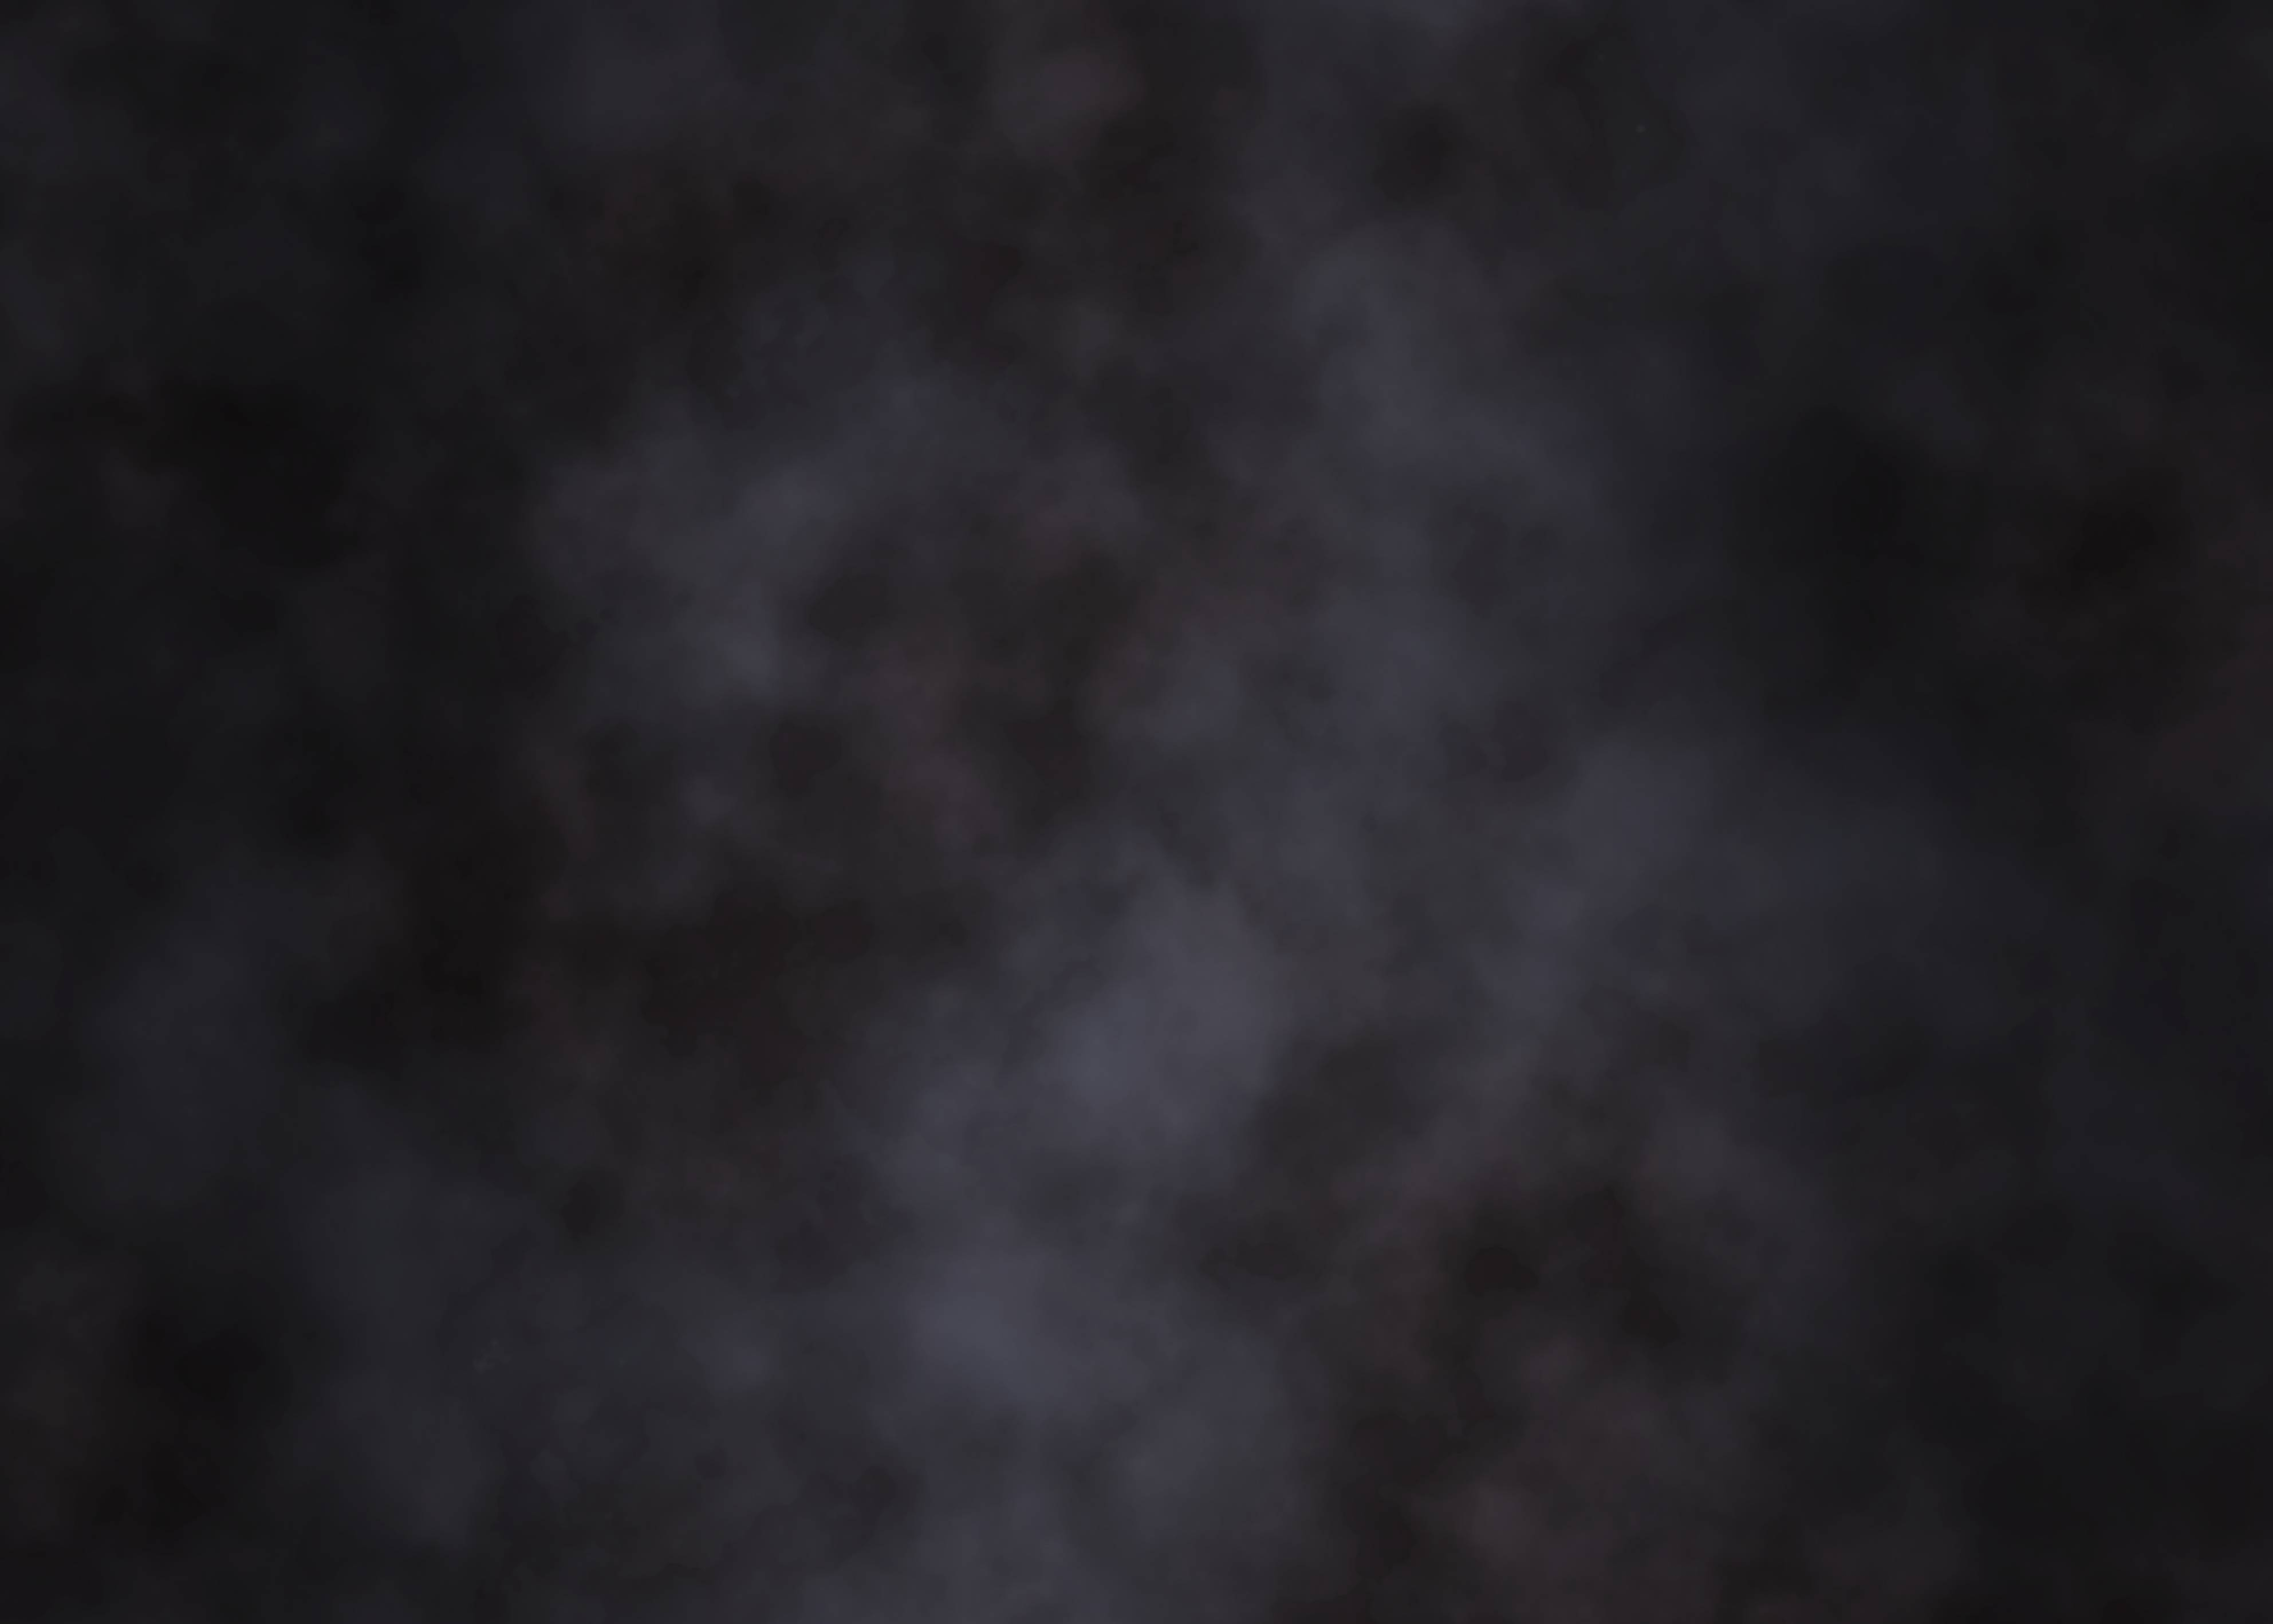 hd wallpaper stealth fighter matte black lambo 1920x1200px matte